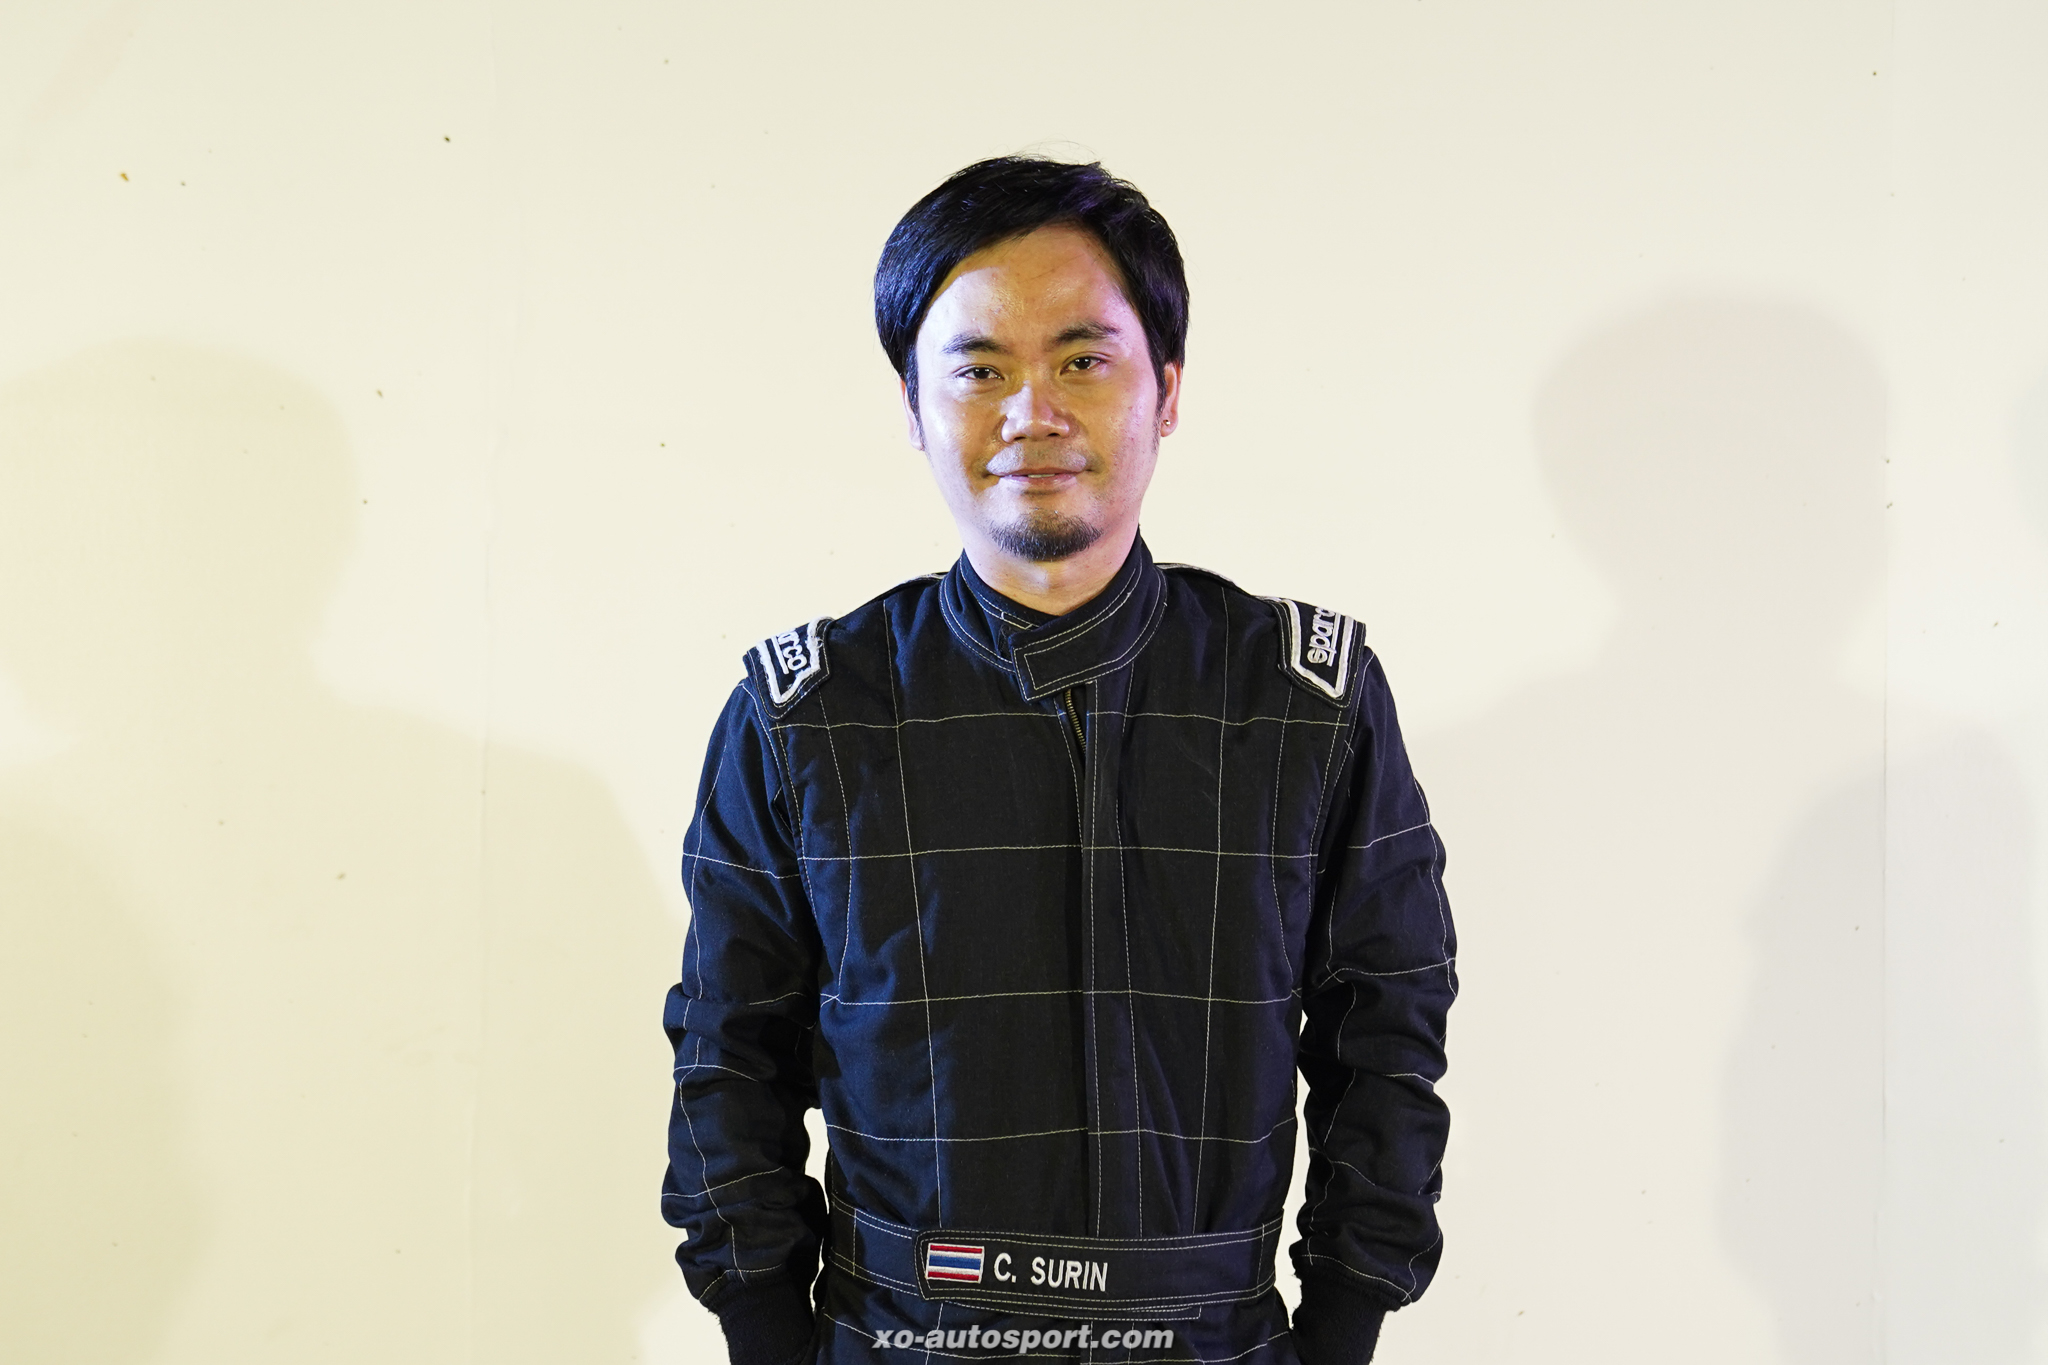 nuang-bansuan-mrx-bangmod-racing-10-812-sec-super-1500-turbo-by-mrx-performance-no-3-DSC02563